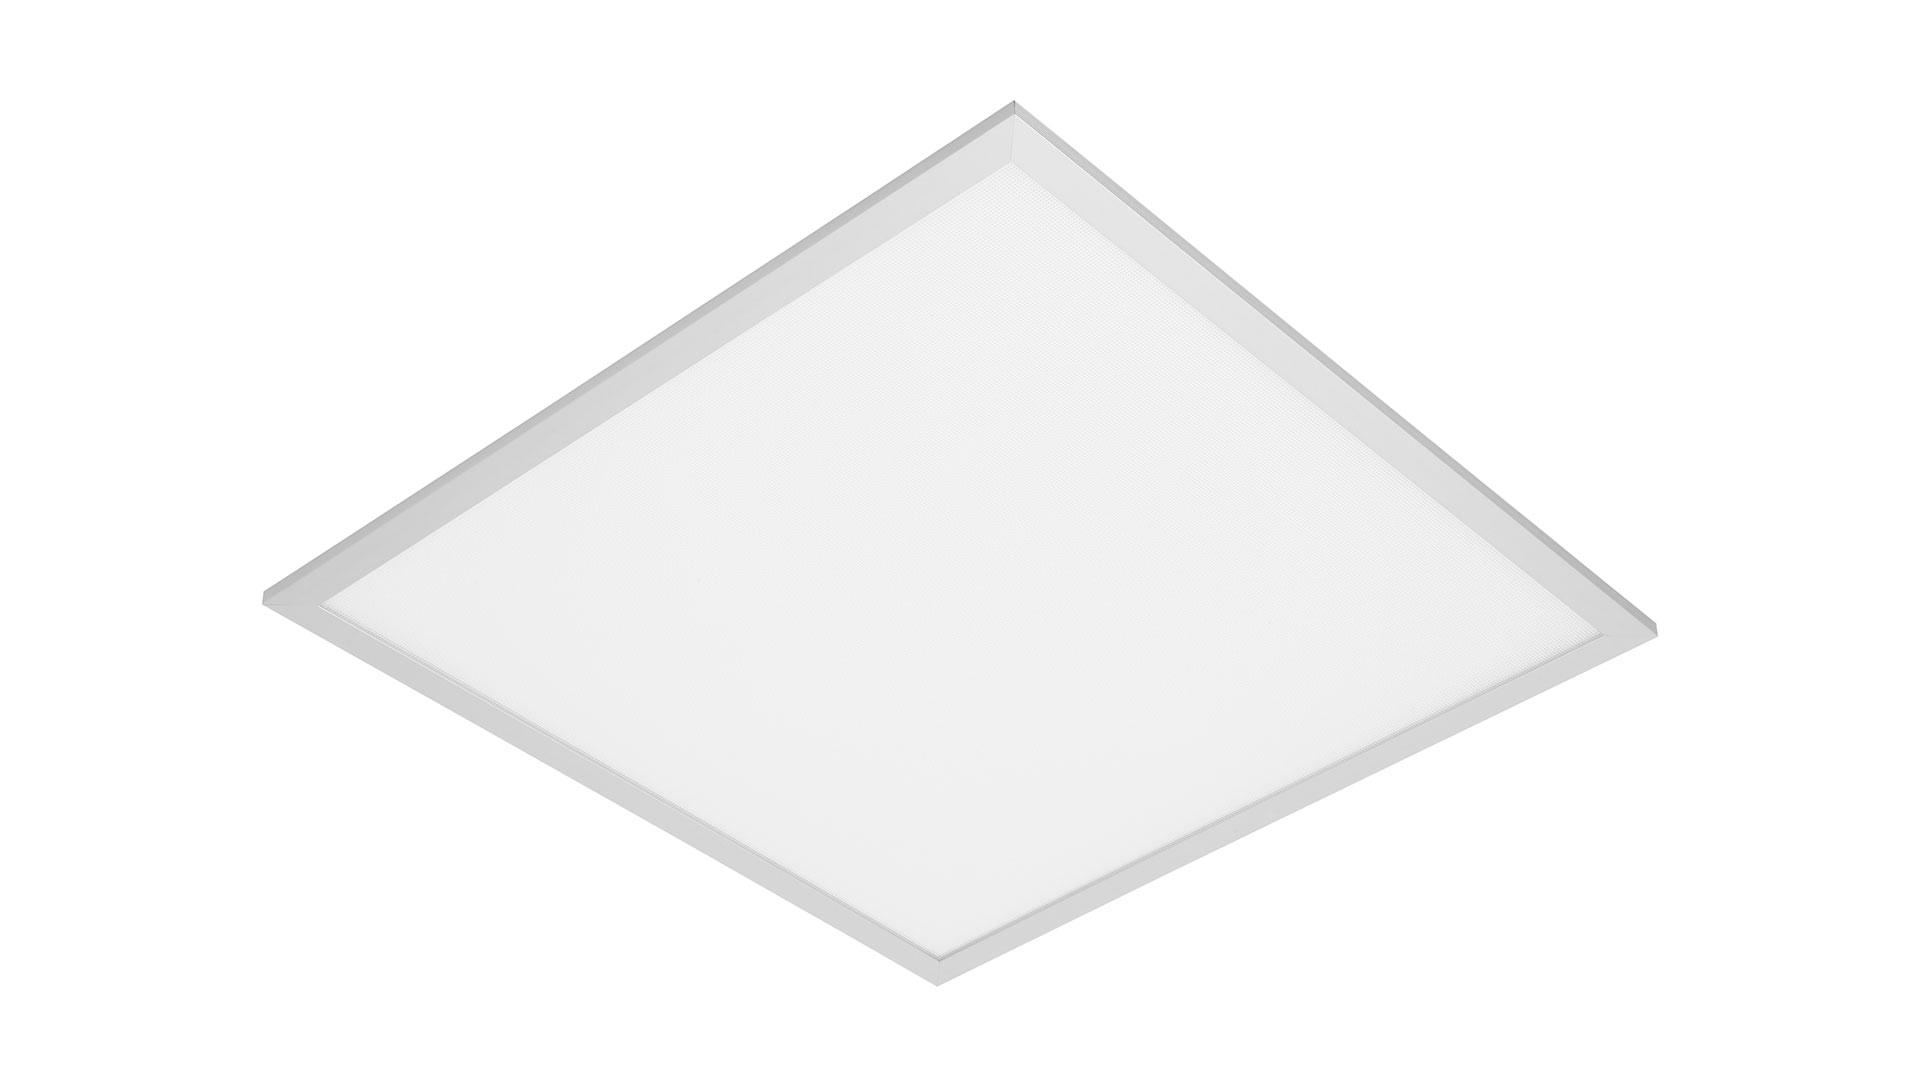 Lano PRO LED 43W, 4200lm, 840, microprisma, DALI, M625, weiß